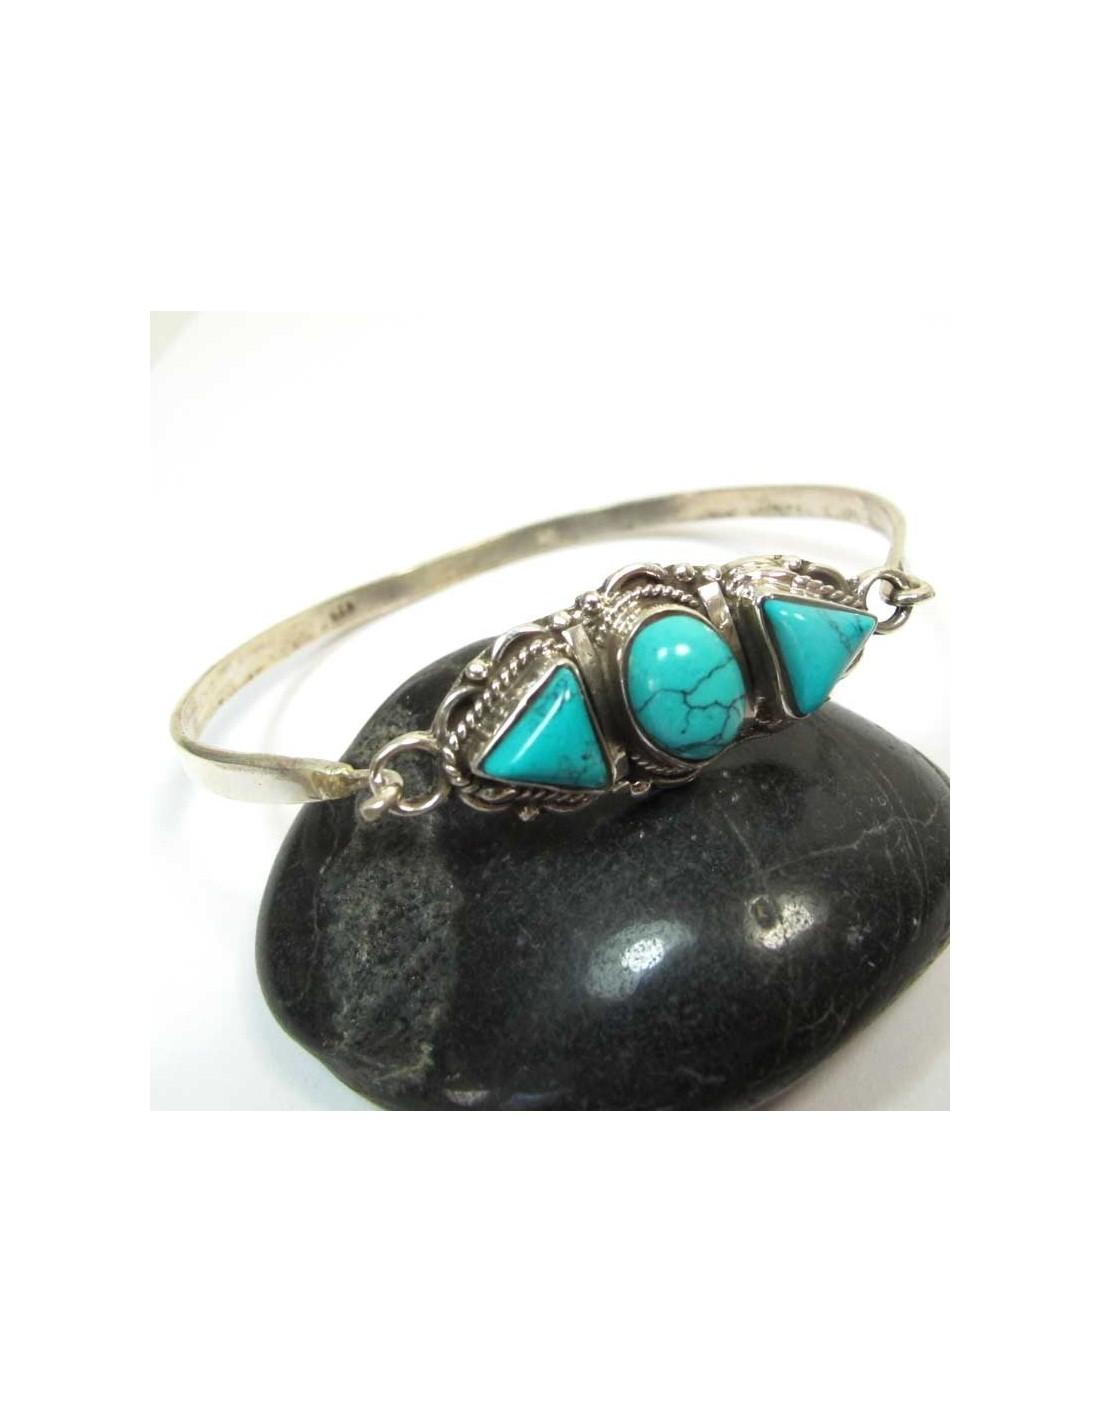 bracelet argent et turquoise bijoux en turquoise br70. Black Bedroom Furniture Sets. Home Design Ideas